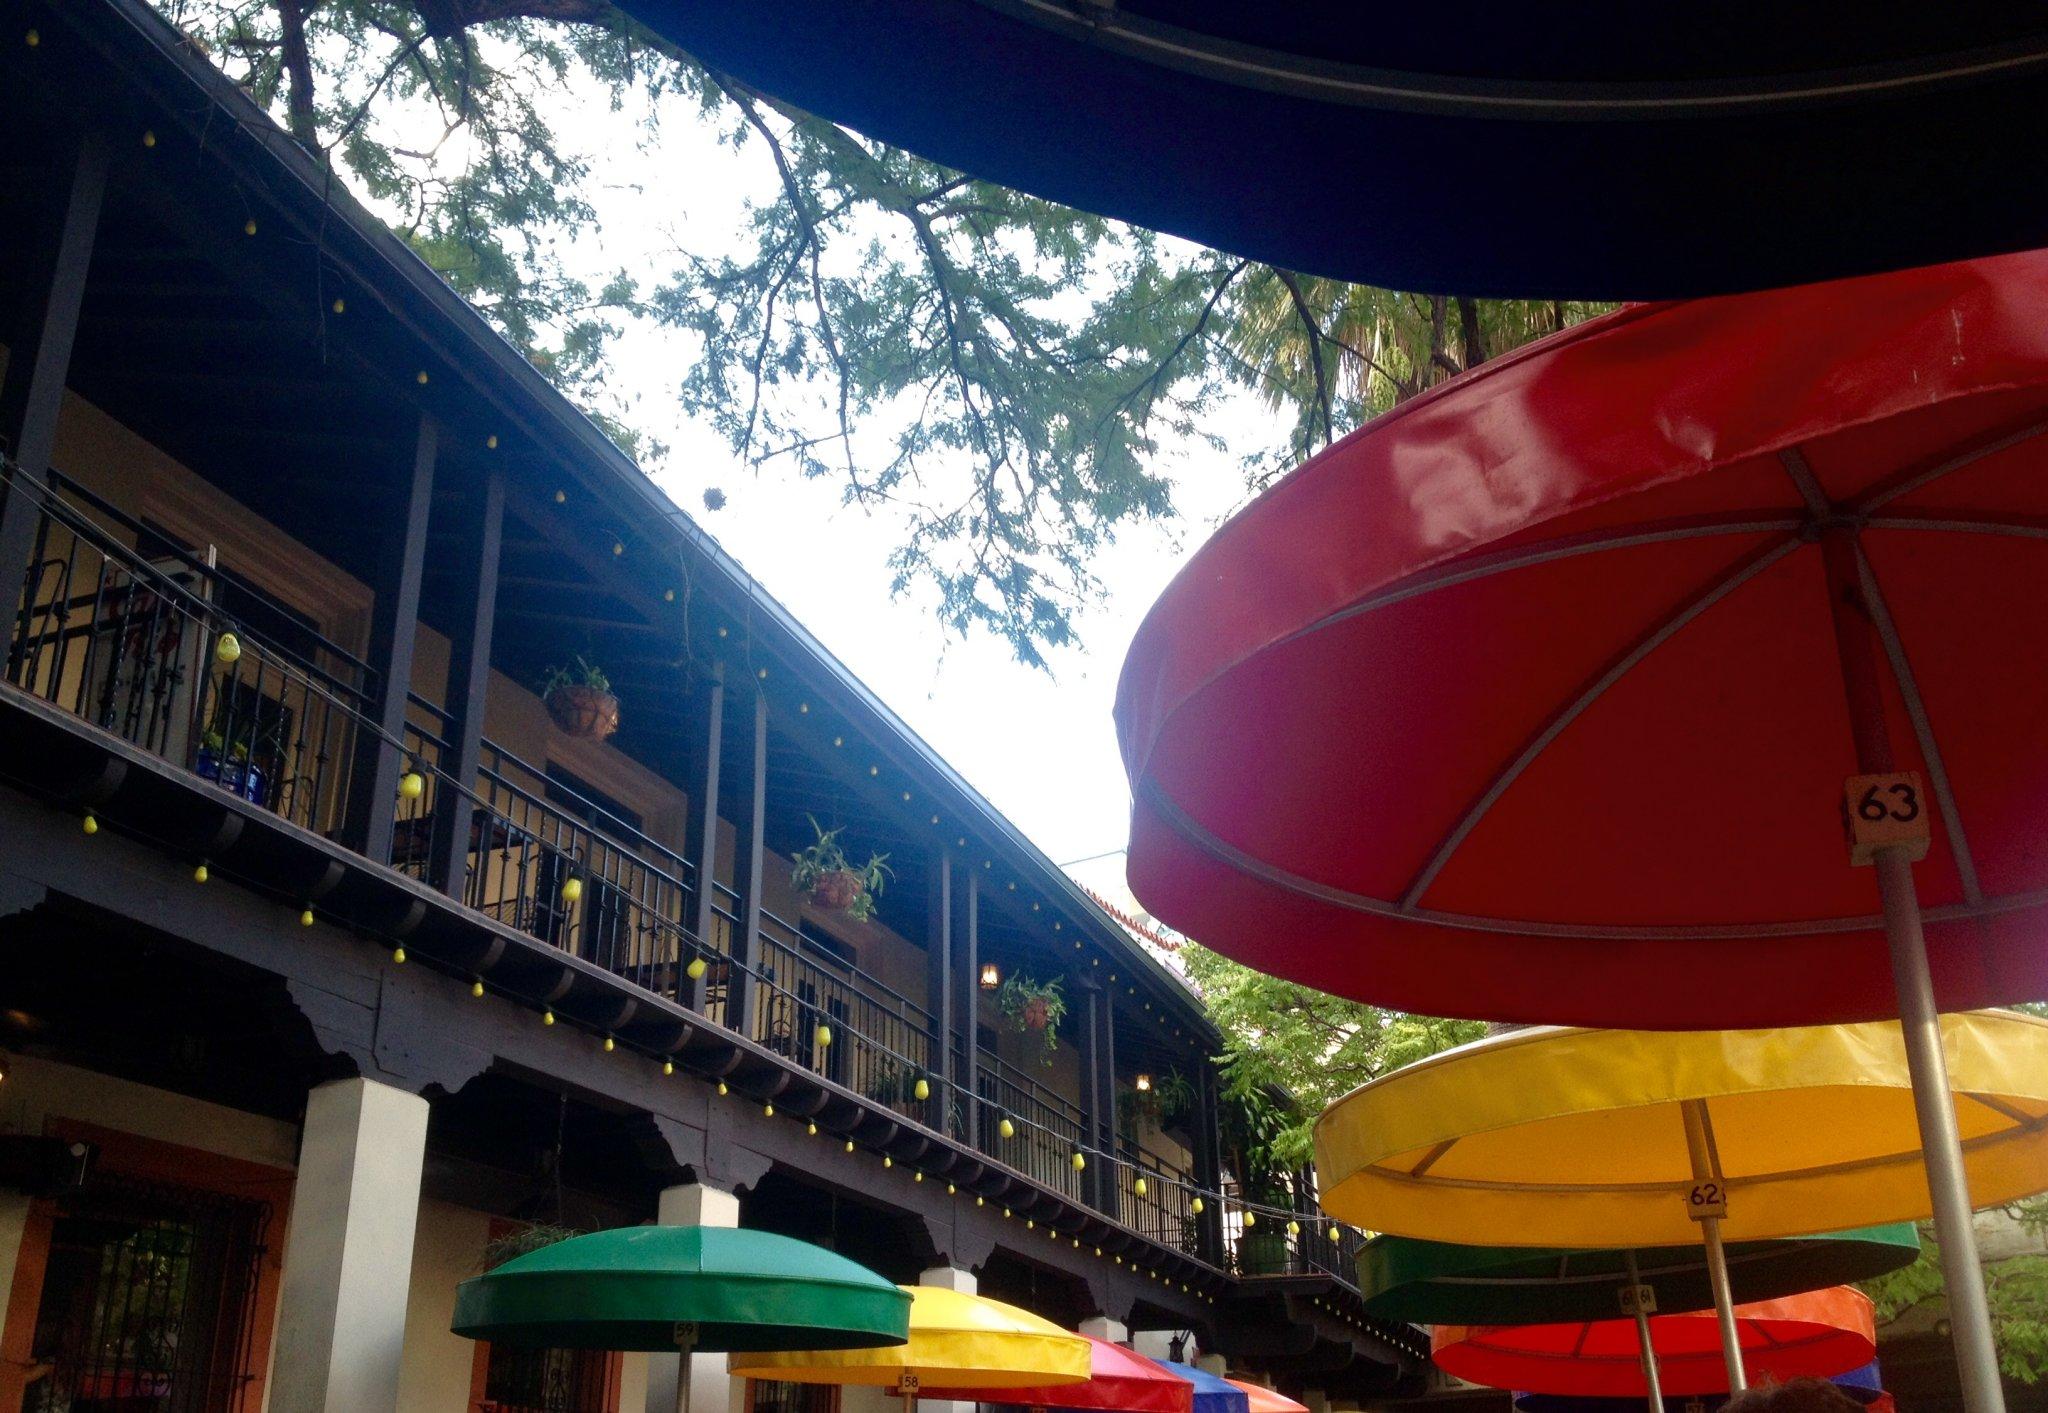 River Walk Restaurants: Casa Rio is one of the Best Restaurants by the River Walk. Check out those umbrellas!